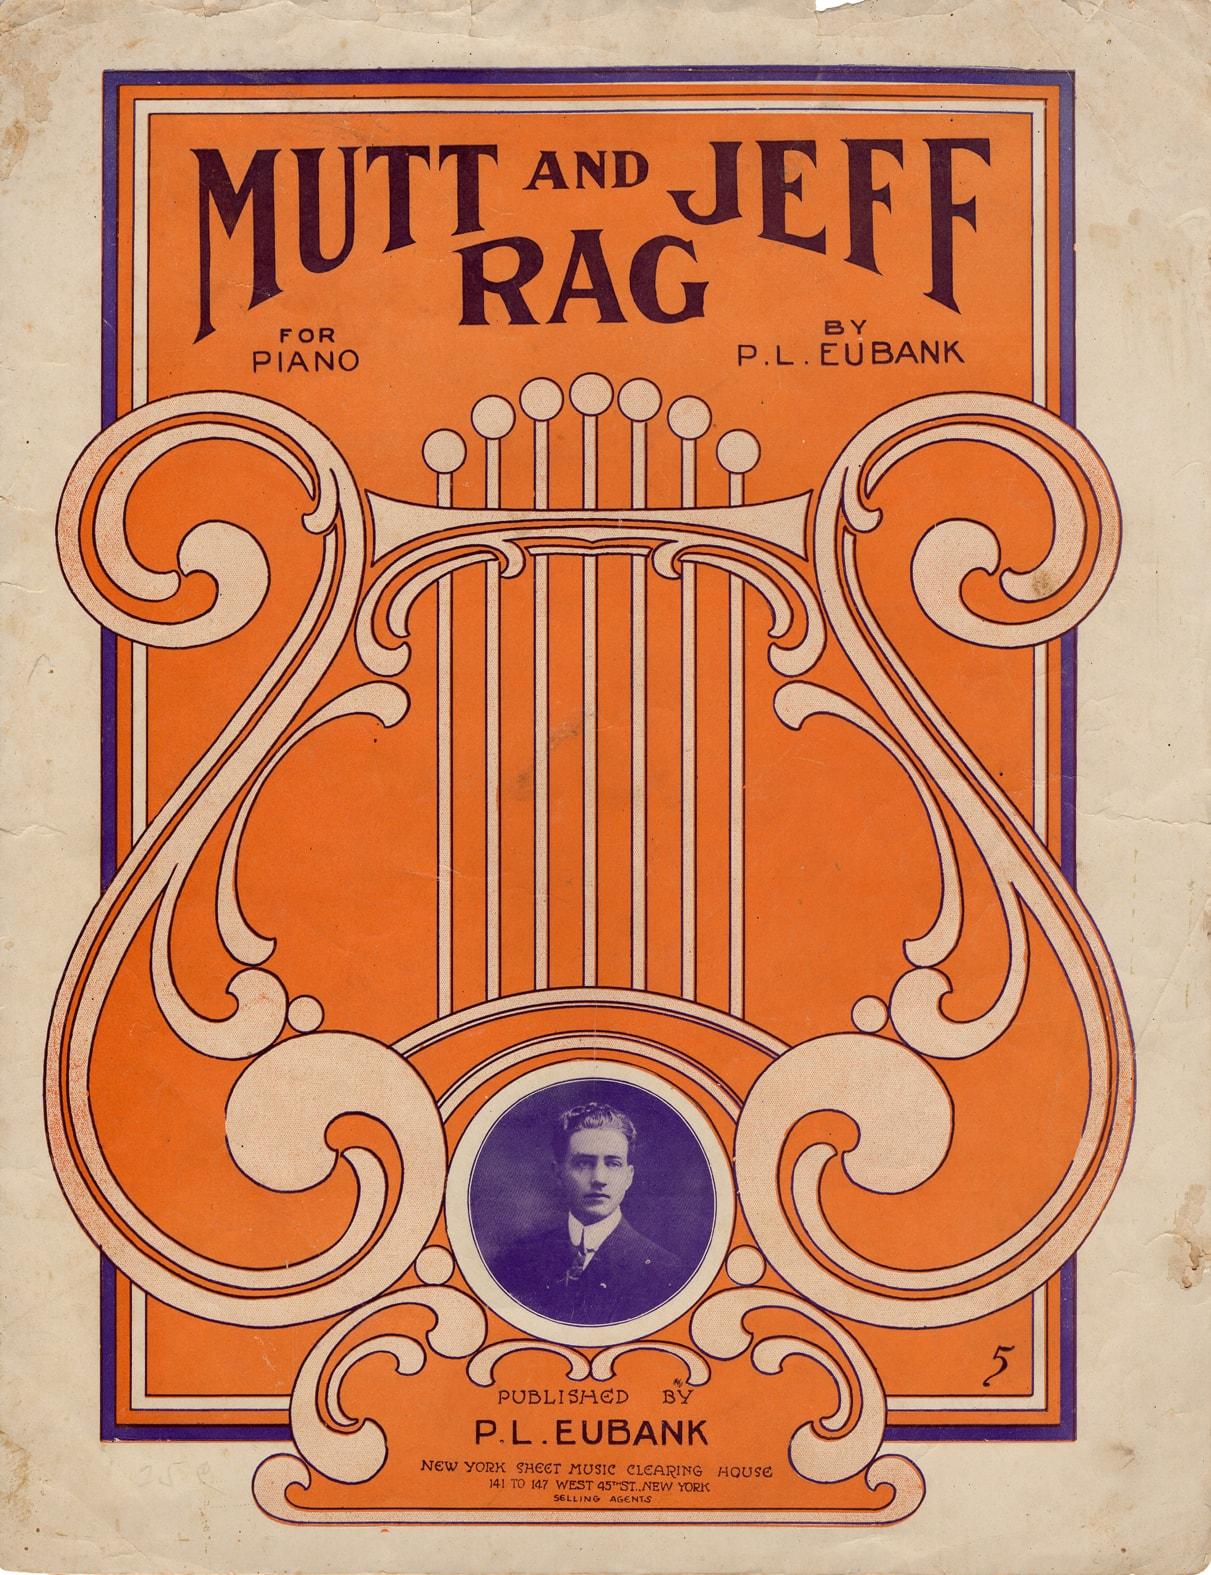 Mutt and Jeff Rag